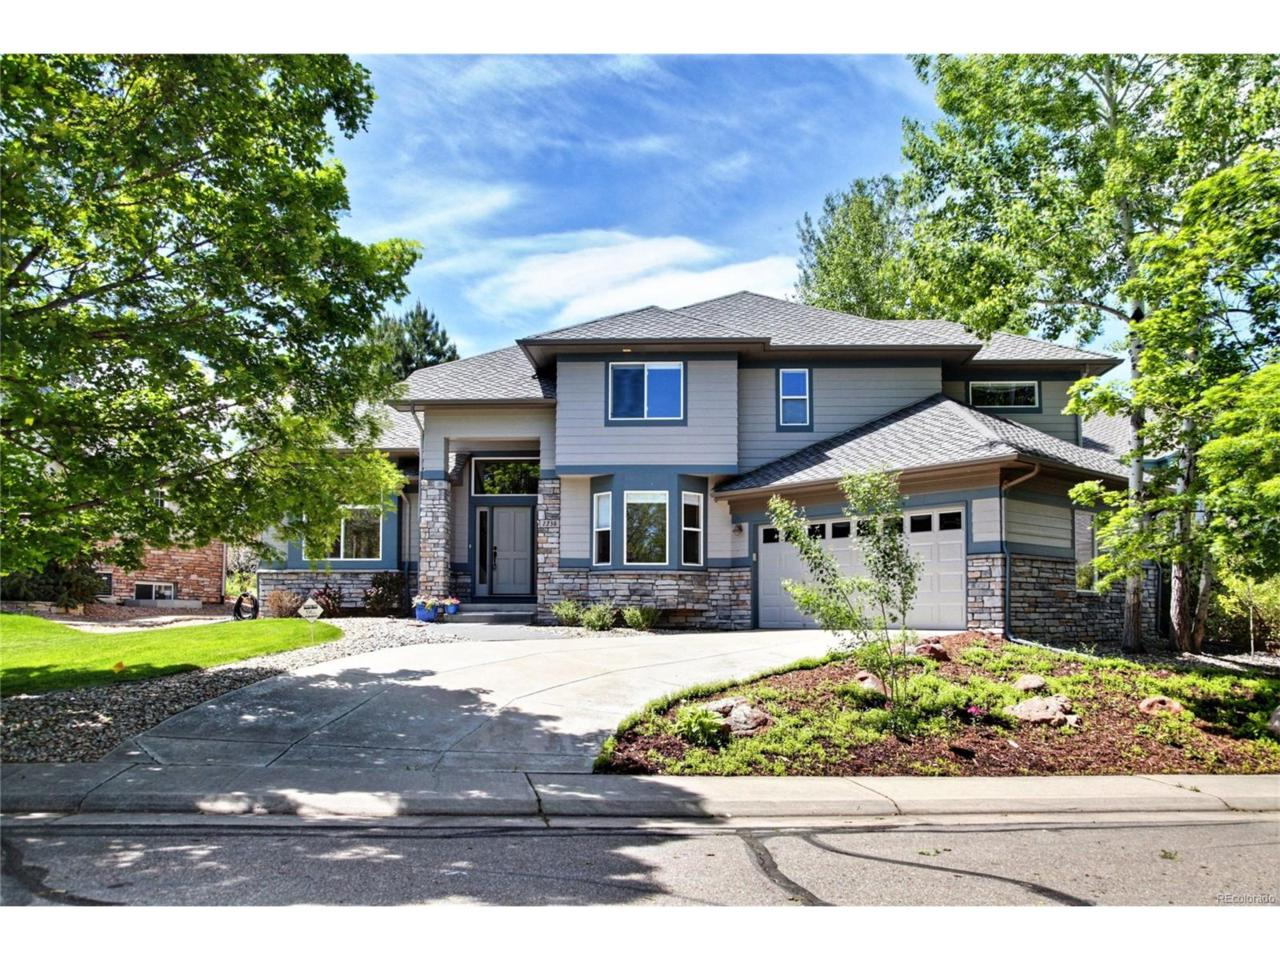 2238 Eagles Nest Drive, Lafayette, CO 80026 (MLS #5957444) :: 8z Real Estate